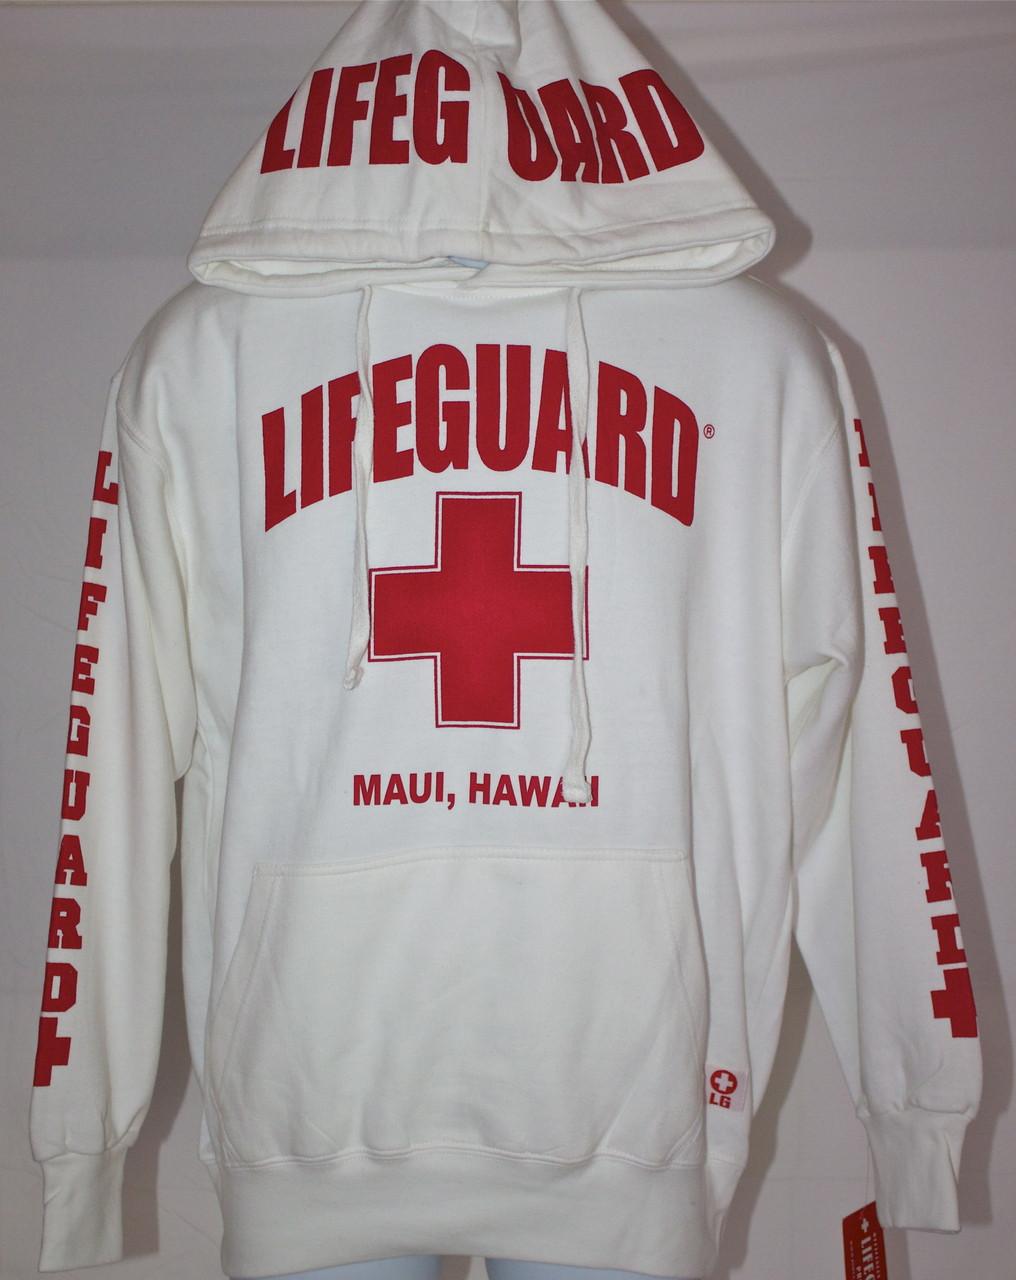 11454e4b6c9 Lifeguard Hoodie in White (Unisex Sizing) - (808)661-7828 Maui s ...